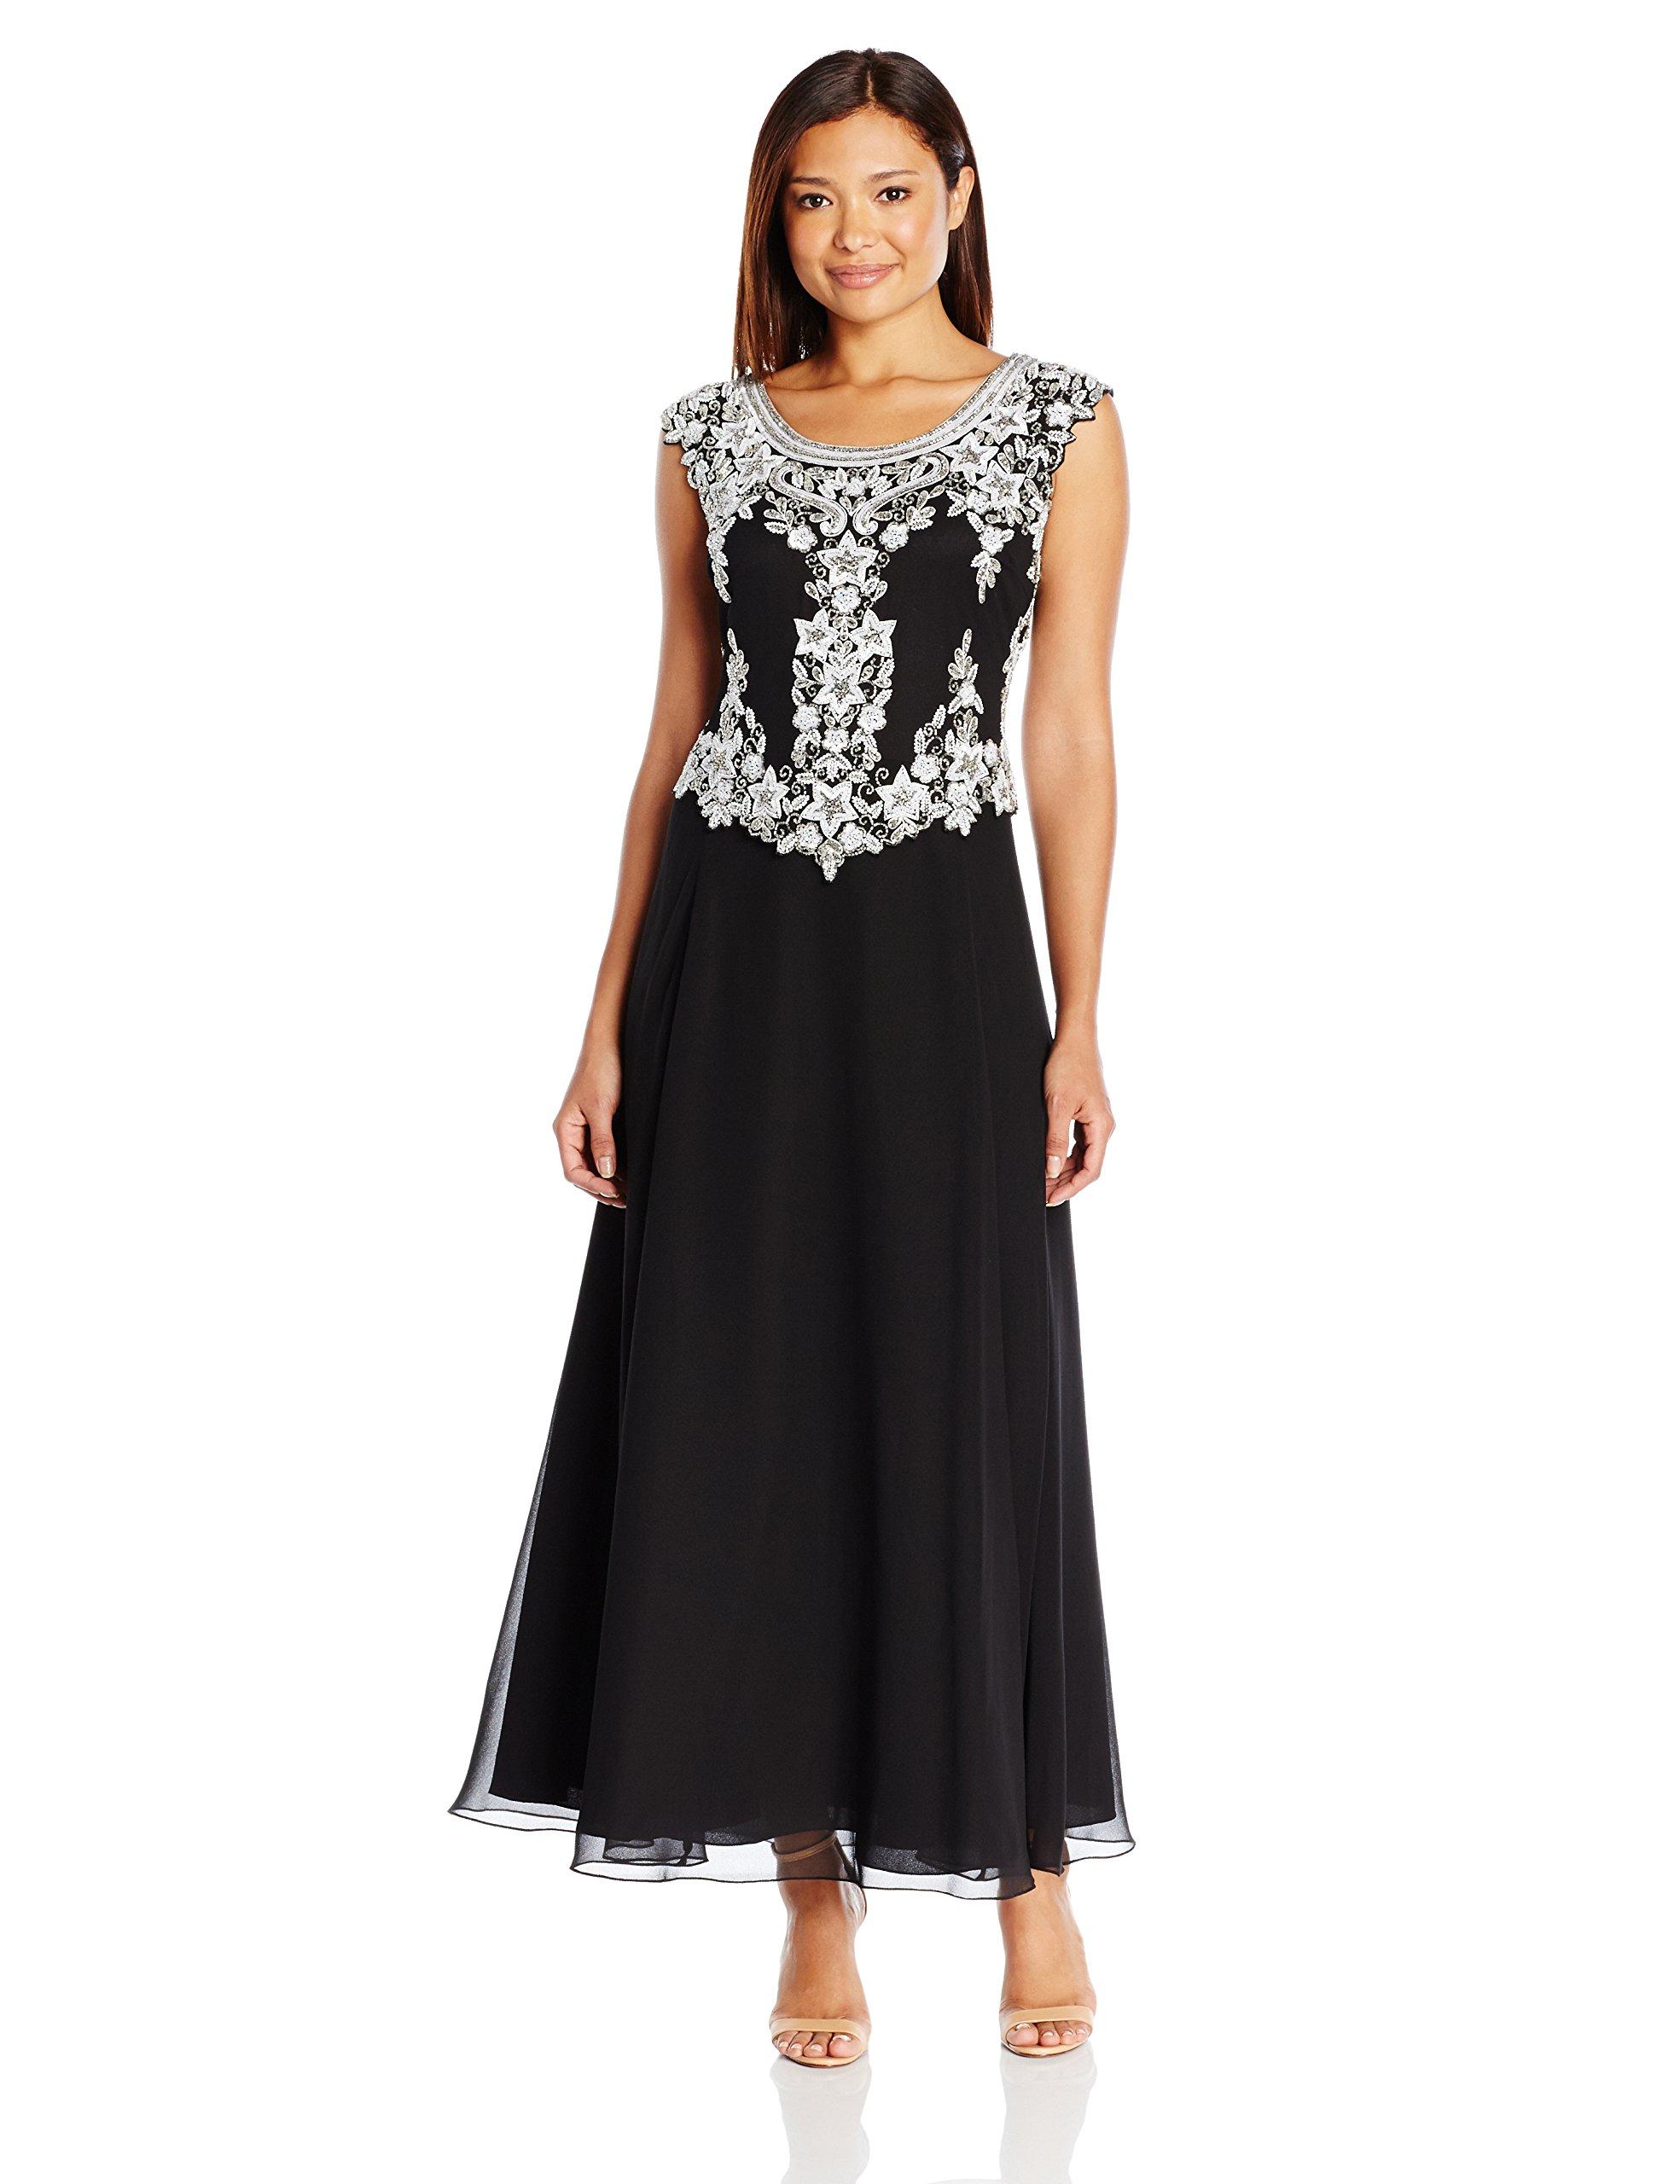 J Kara Women's Petite Cap Sleeve Beaded Top Long Dress, Black/White/Silver, 14P